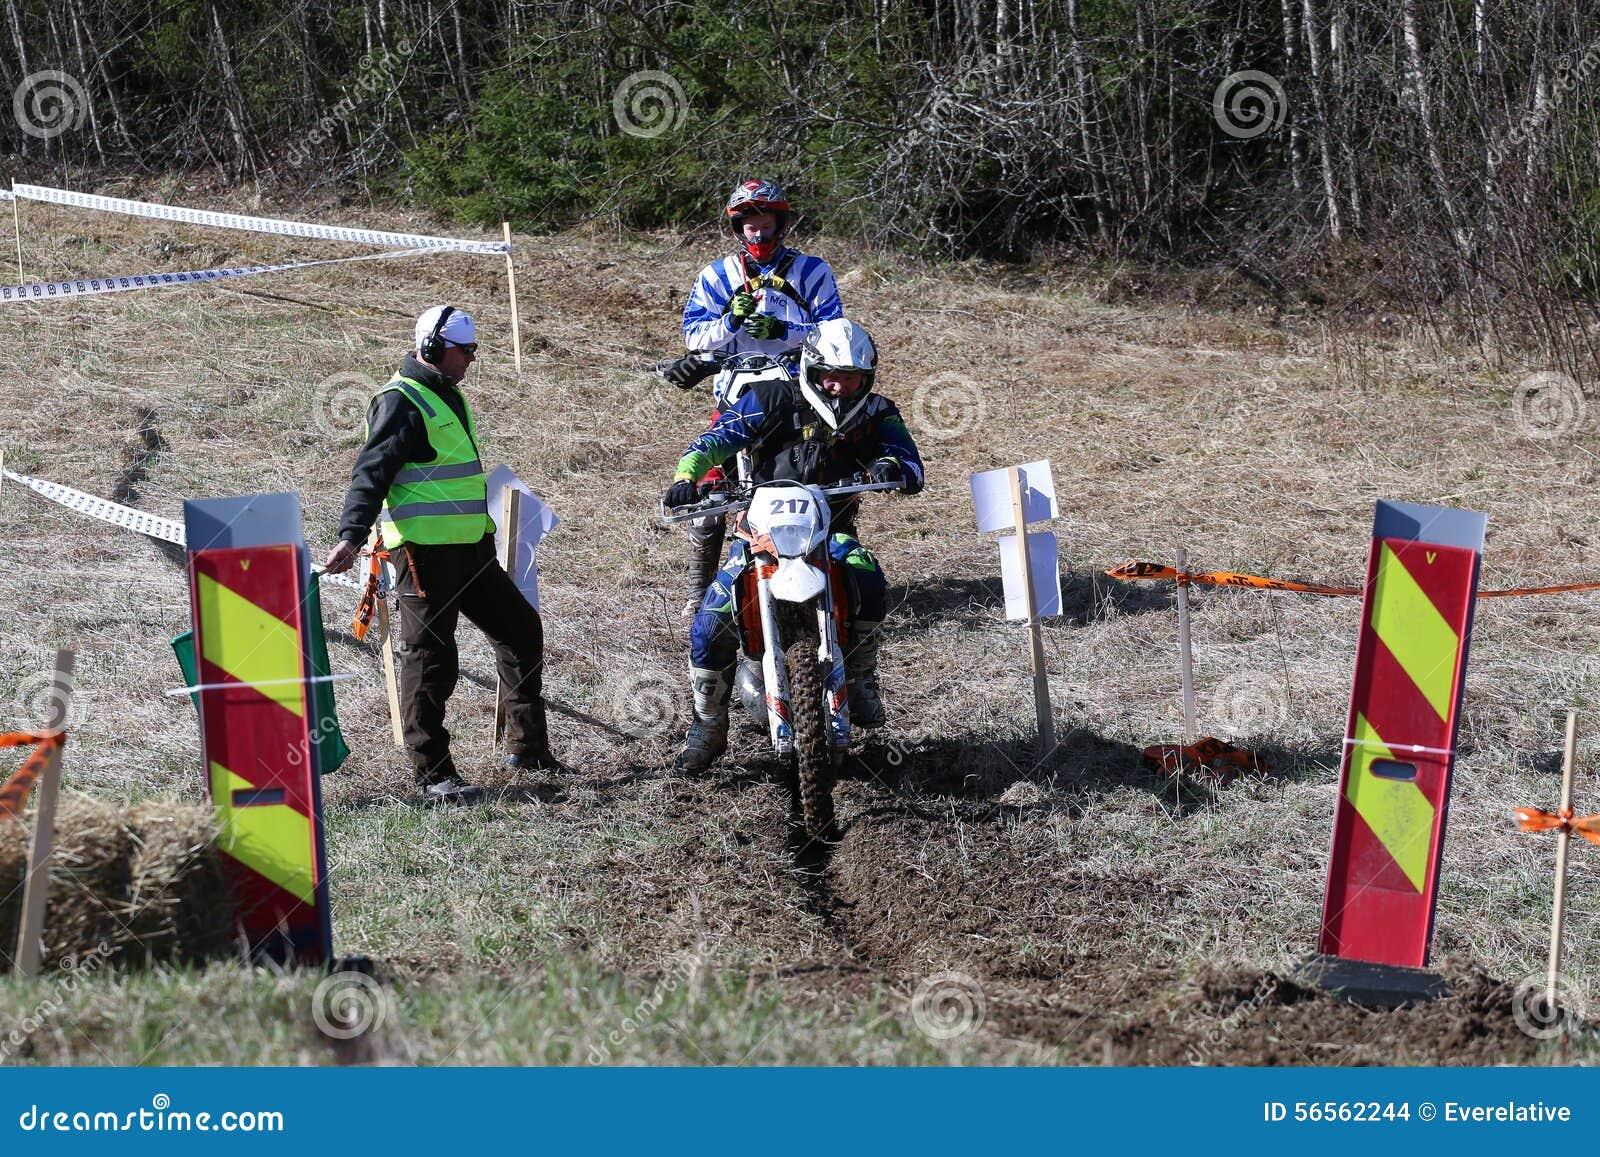 Download Αναβάτης Enduro στη μοτοσικλέτα του Εκδοτική Στοκ Εικόνα - εικόνα από μηχανή, υπαίθριος: 56562244